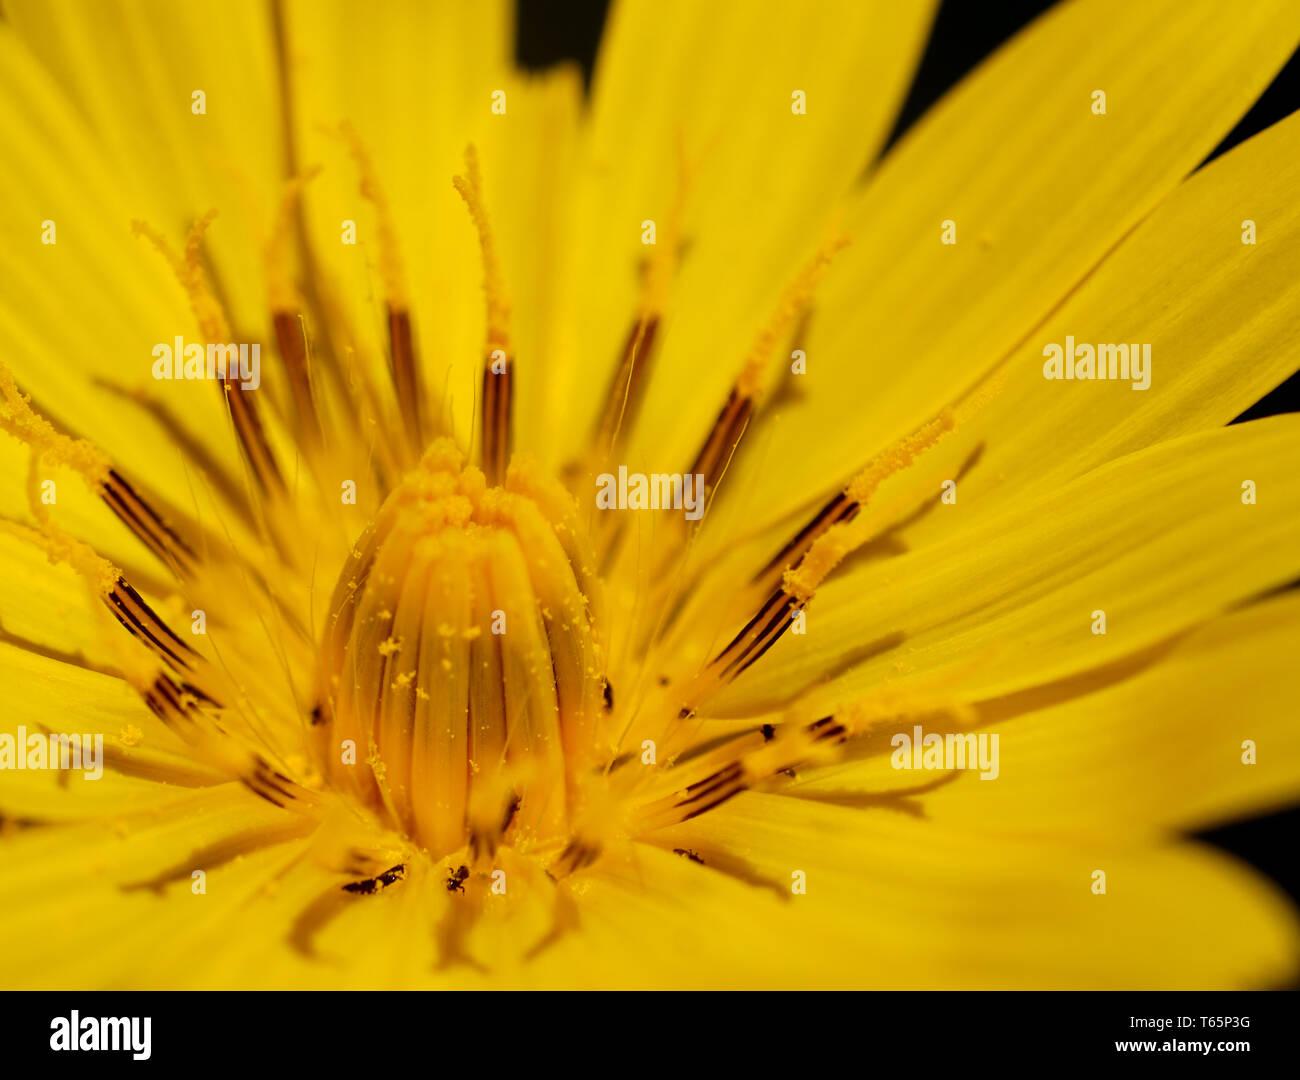 Flowering Plant - Dandelion - Stock Image